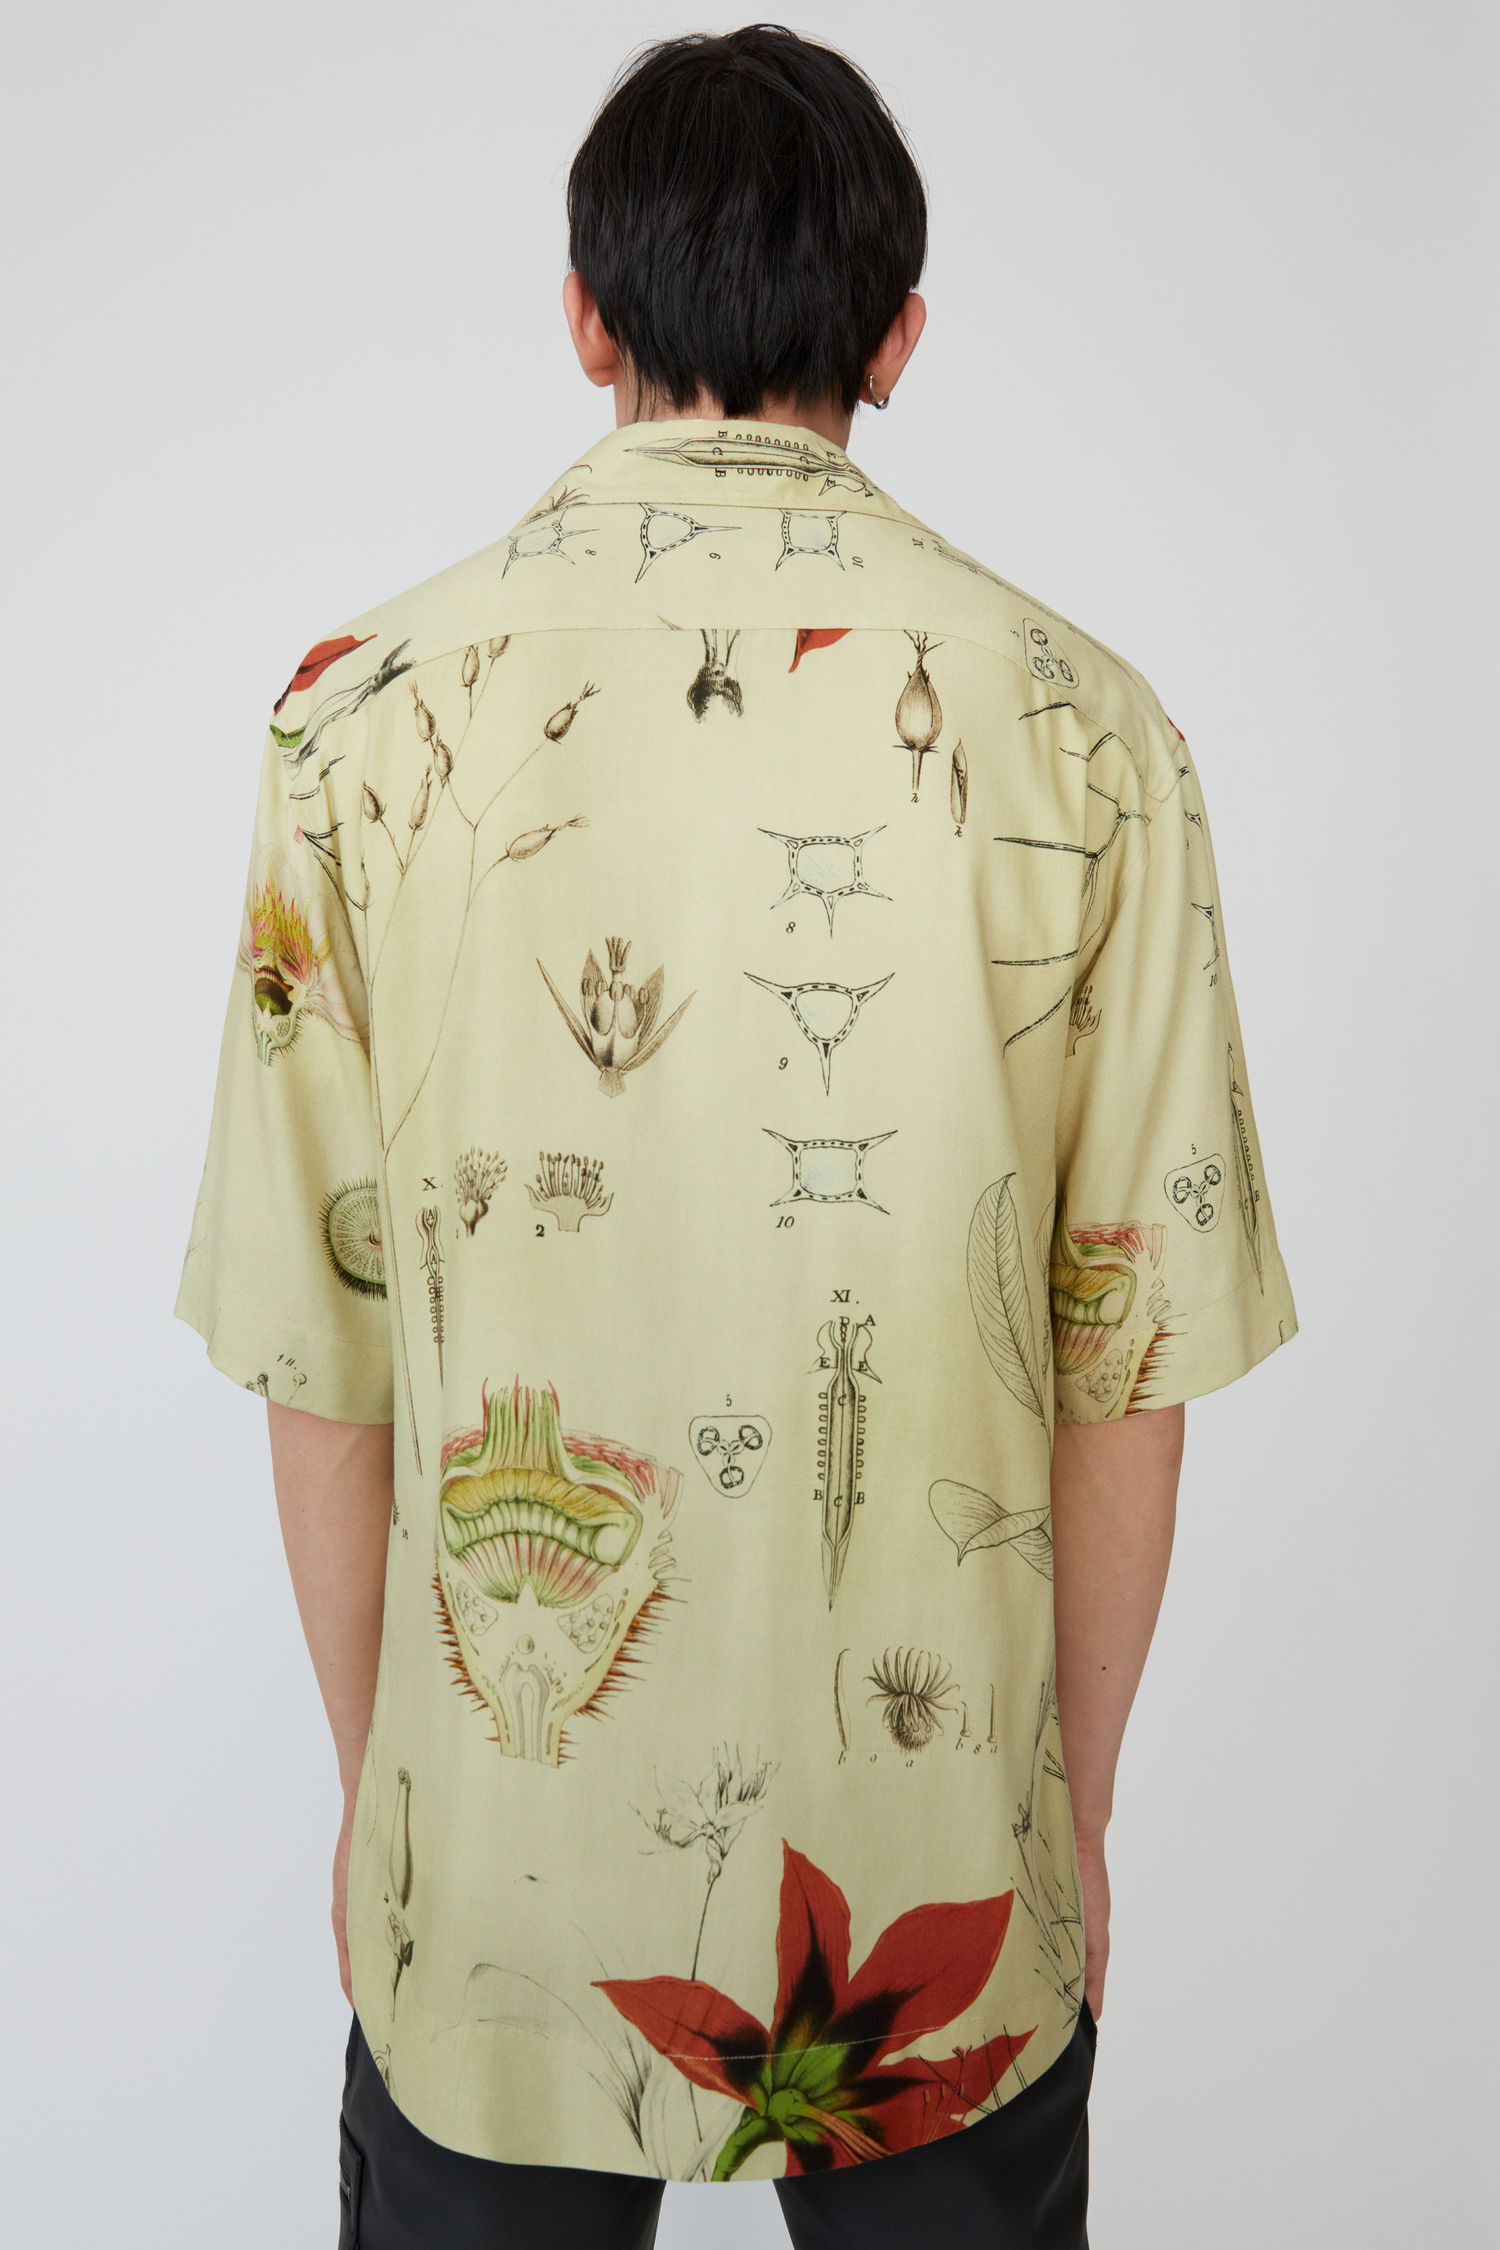 acne_studios_botanical_print_shirt_2.jpg